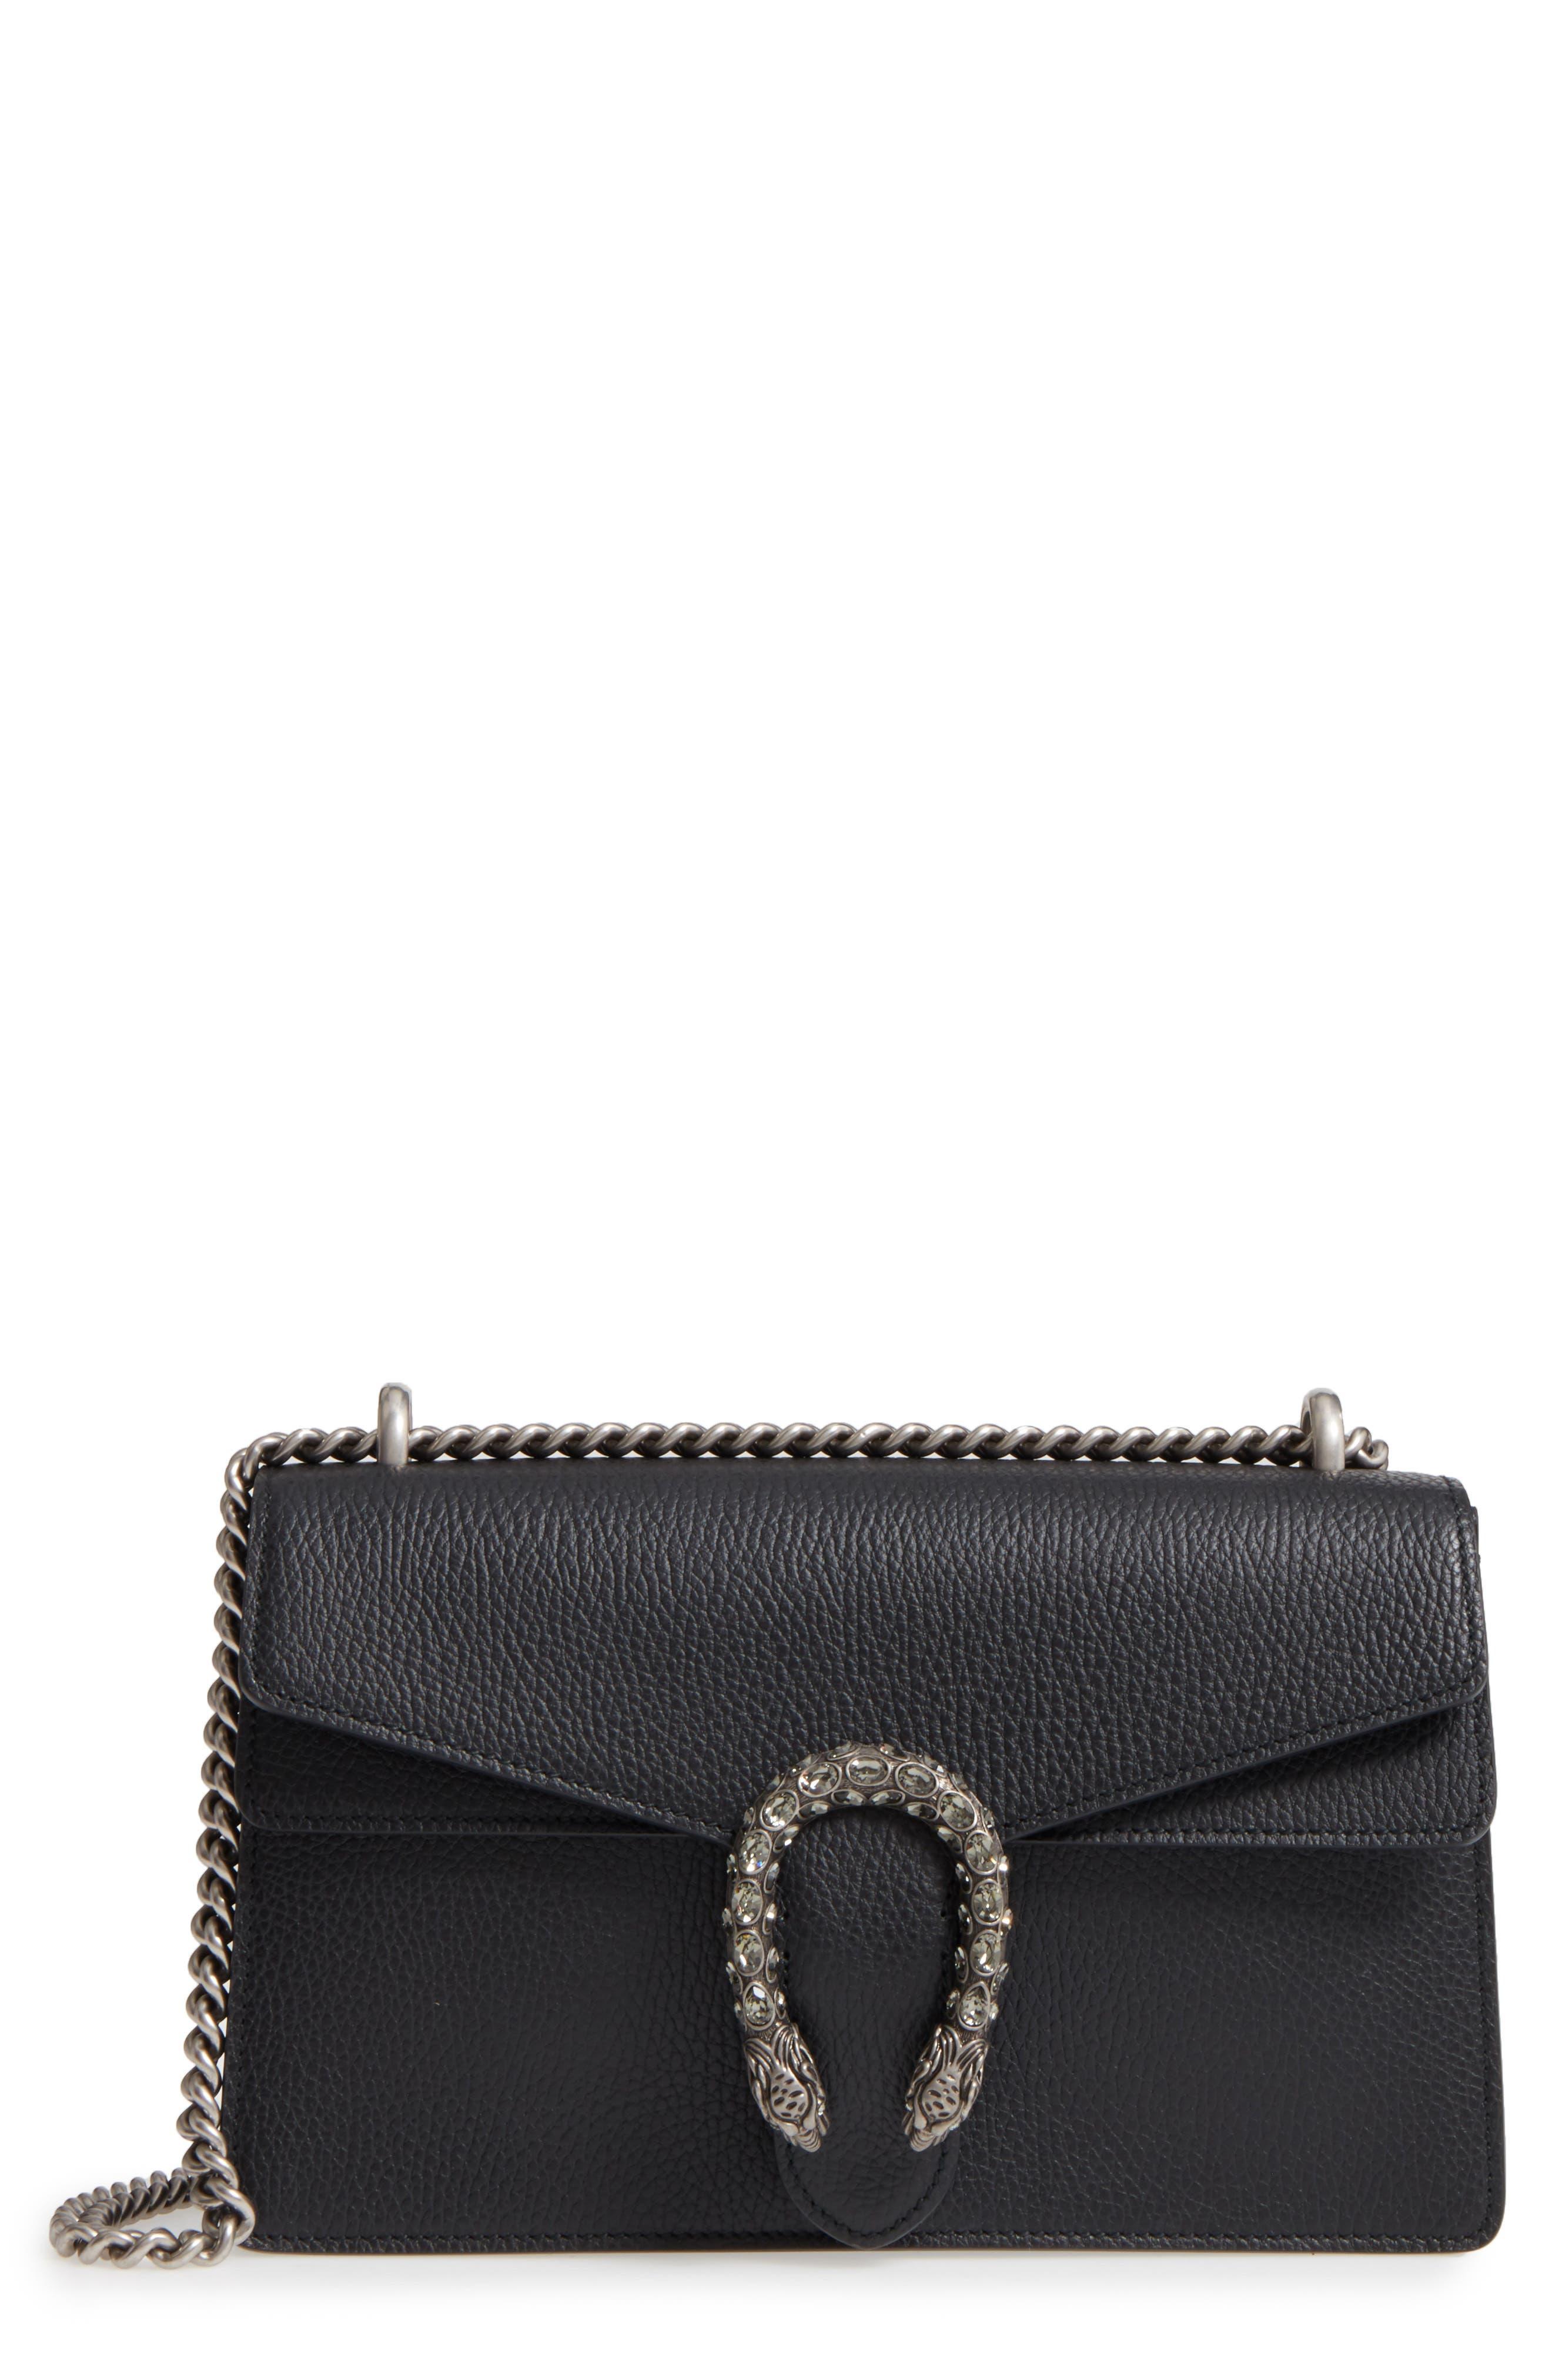 Small Dionysus Leather Shoulder Bag,                             Main thumbnail 1, color,                             8176 NERO/BLACK DIAMOND